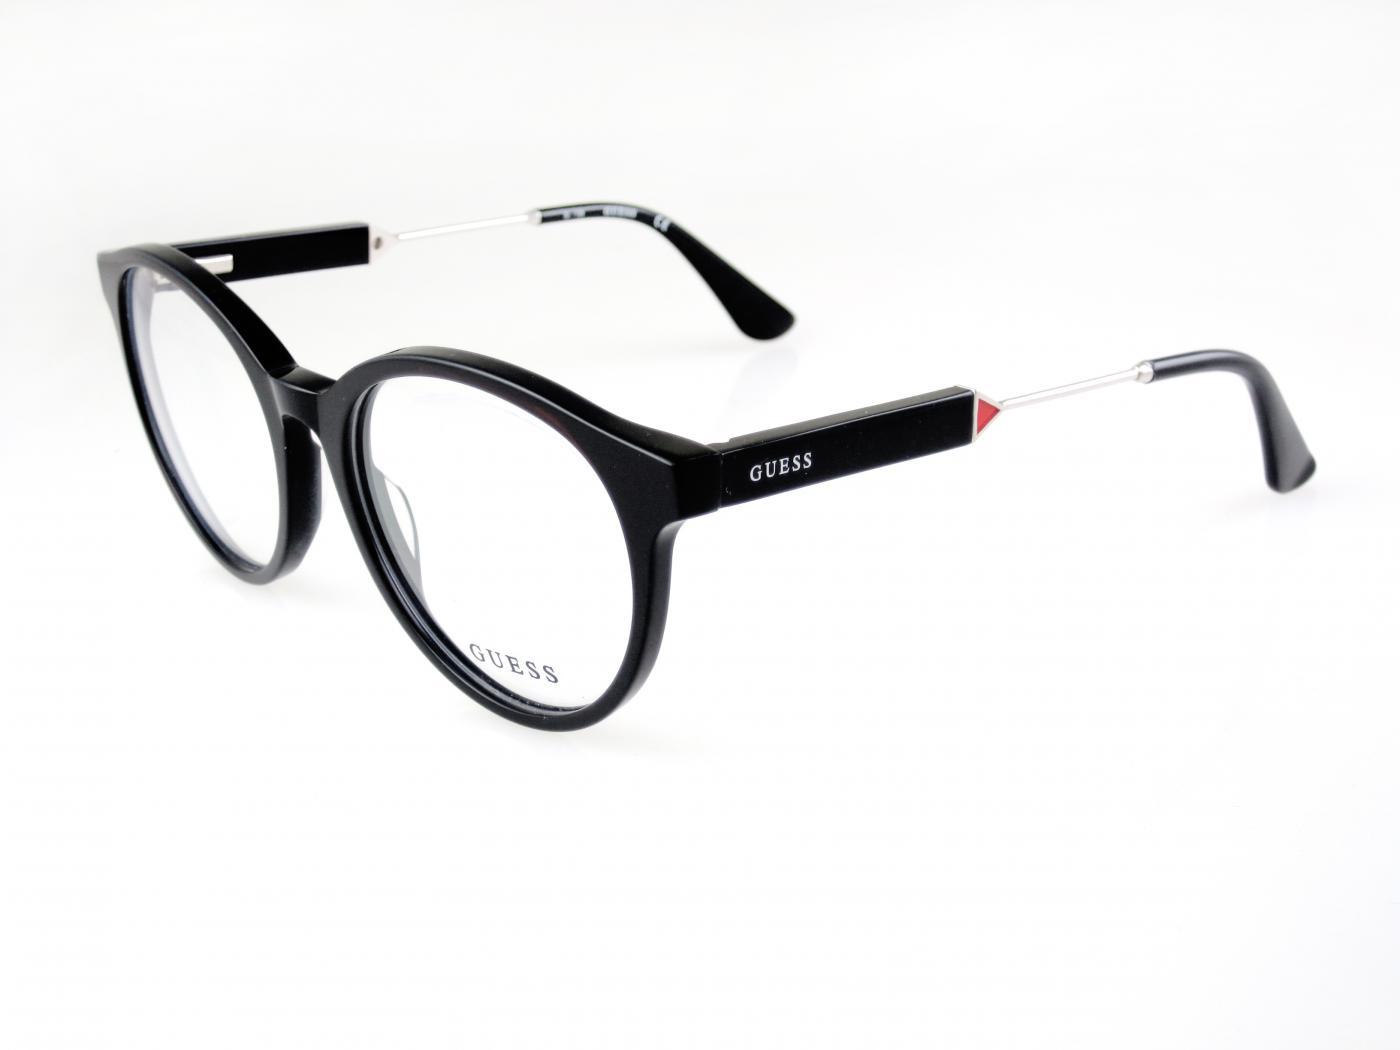 aa70644c8 Dámske dioptrické okuliare Guess | oftalens.sk